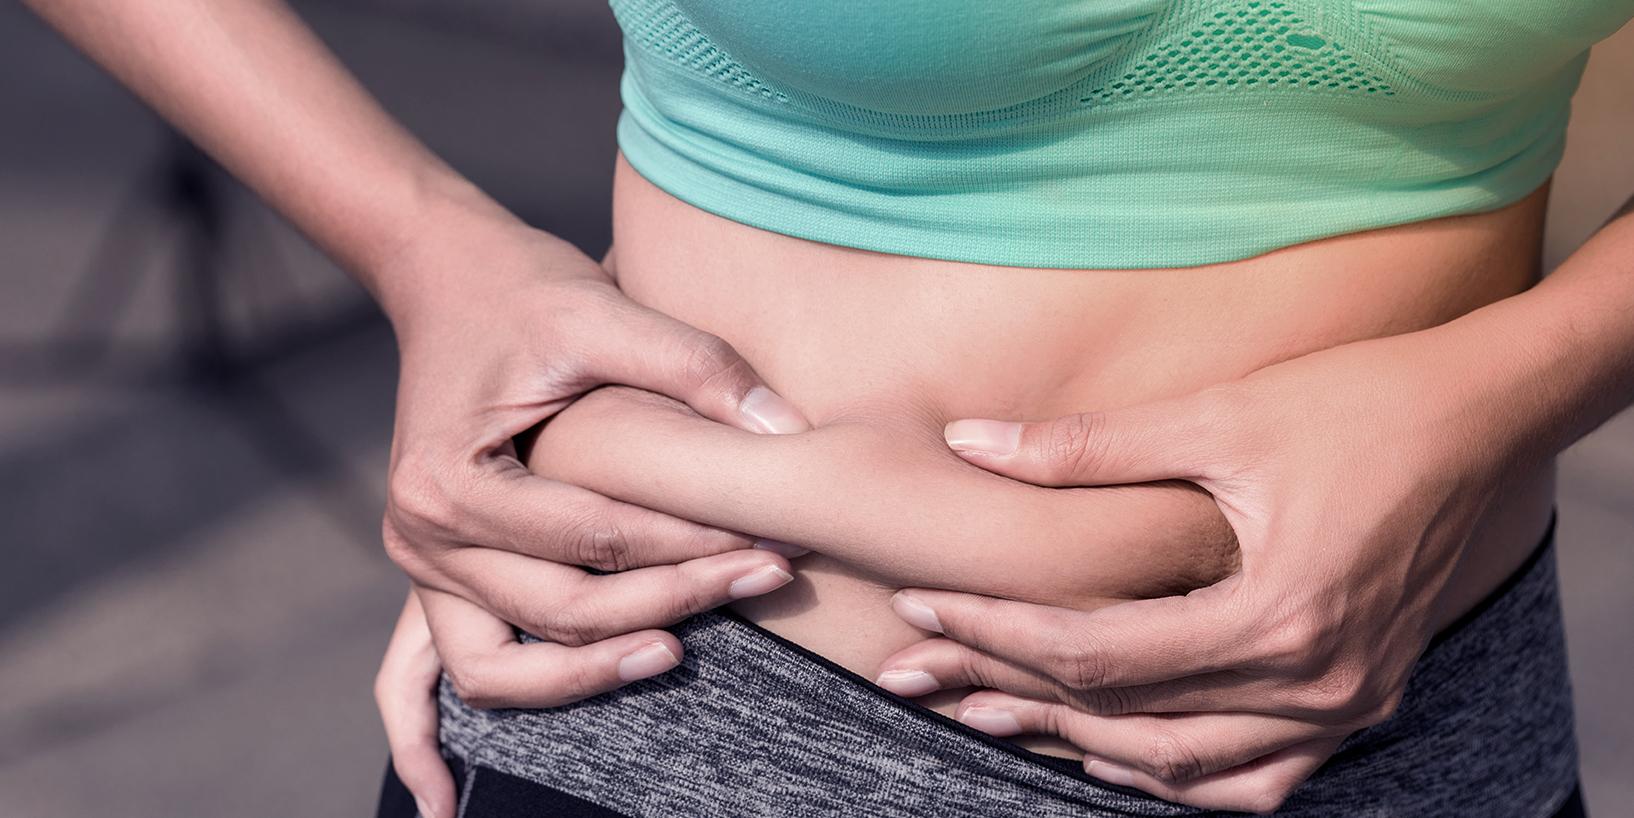 Photograph of woman grabbing slight stubborn belly fat